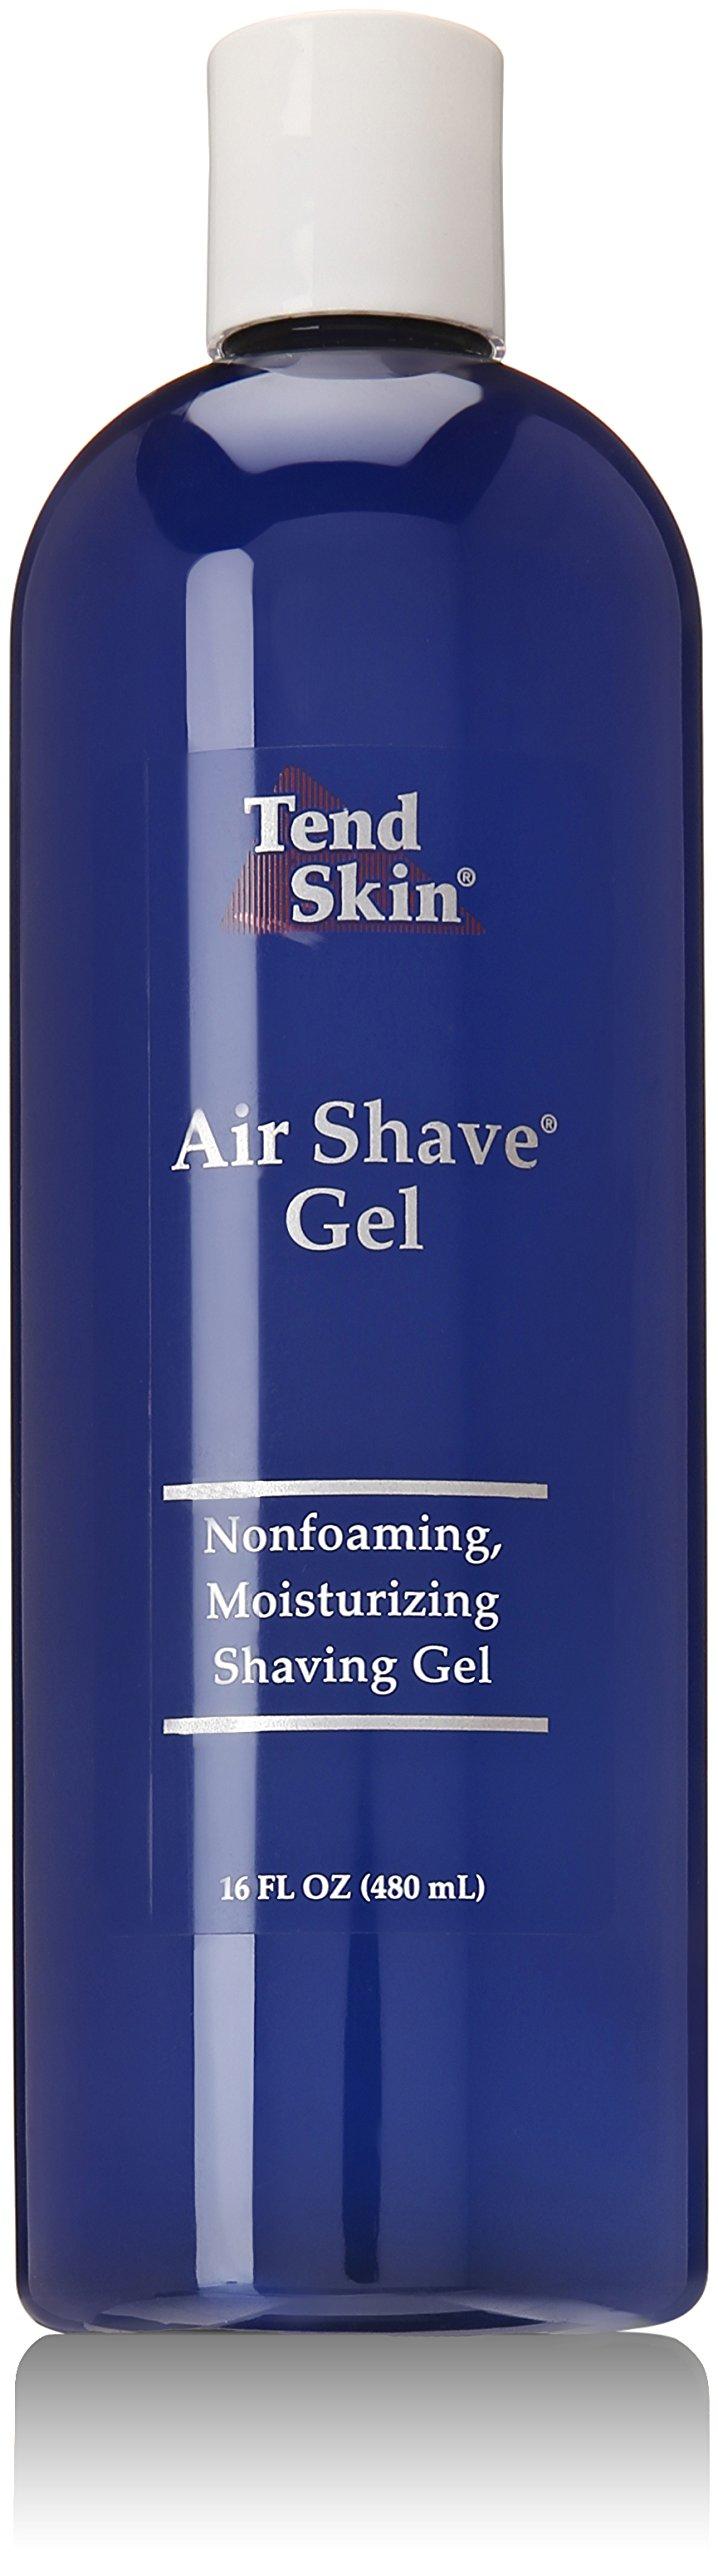 Tend Skin Air Shave Gel, 16 oz by Tend Skin